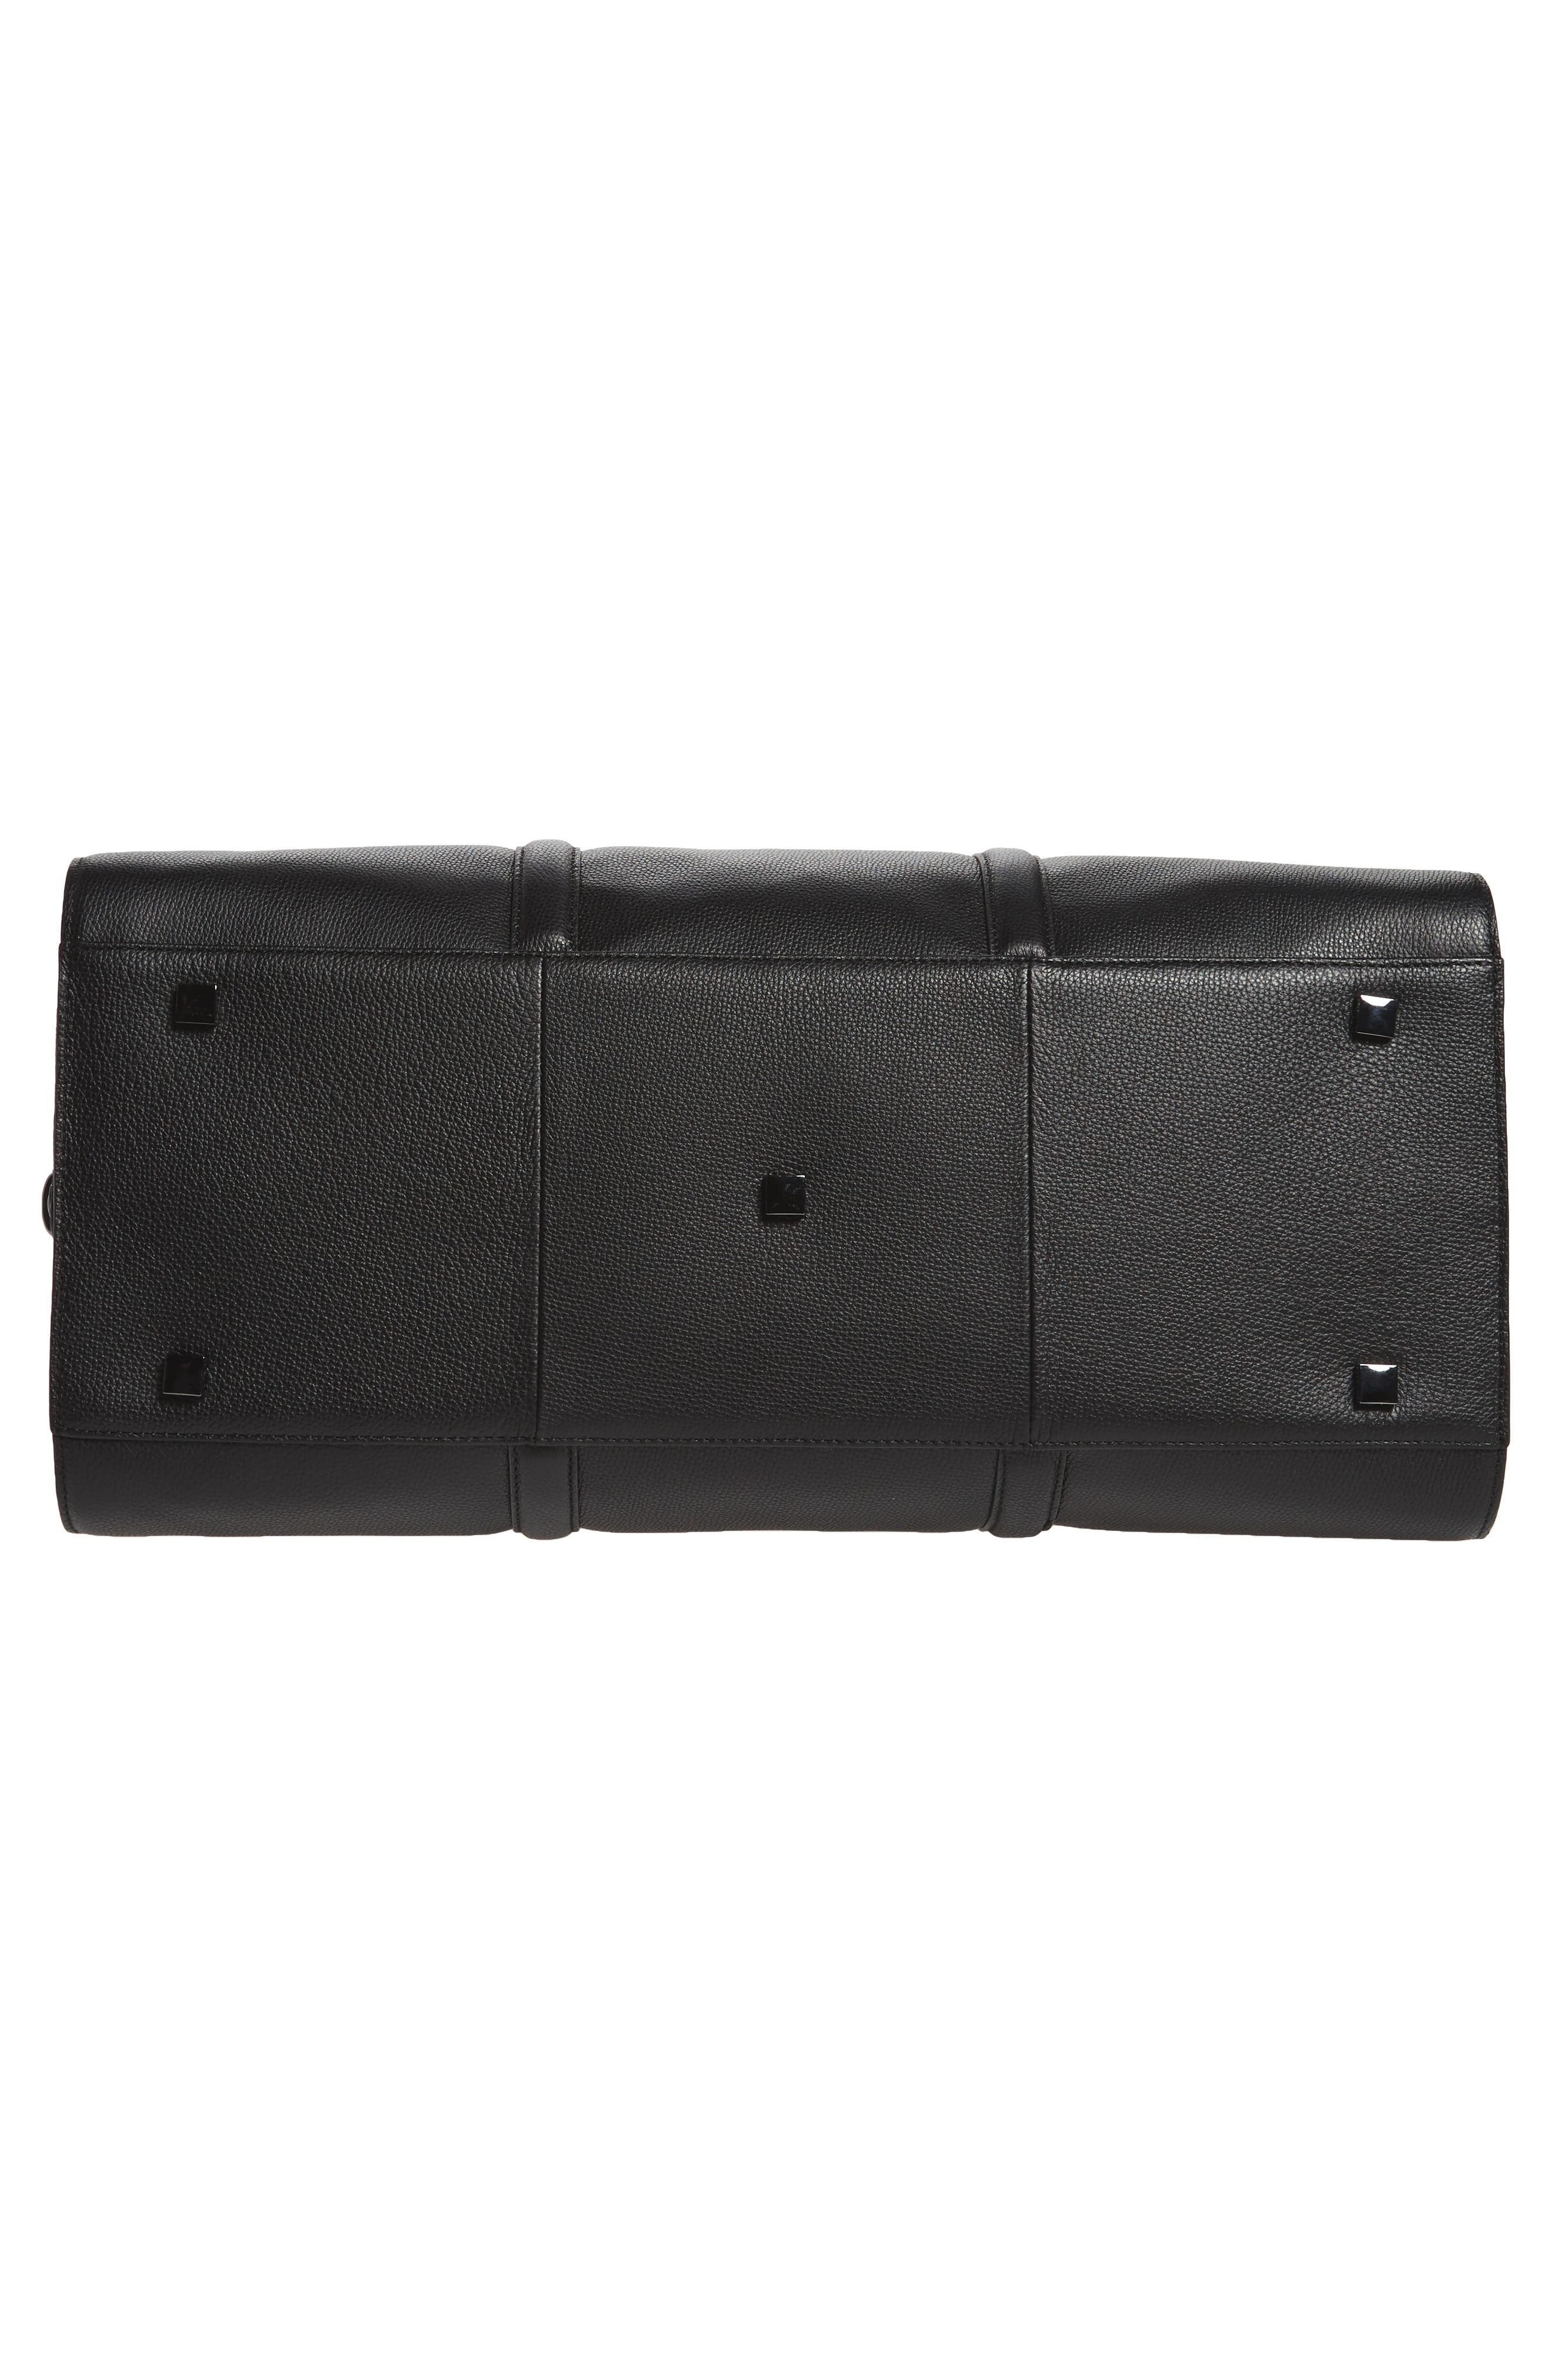 Leather Duffel Bag,                             Alternate thumbnail 6, color,                             001